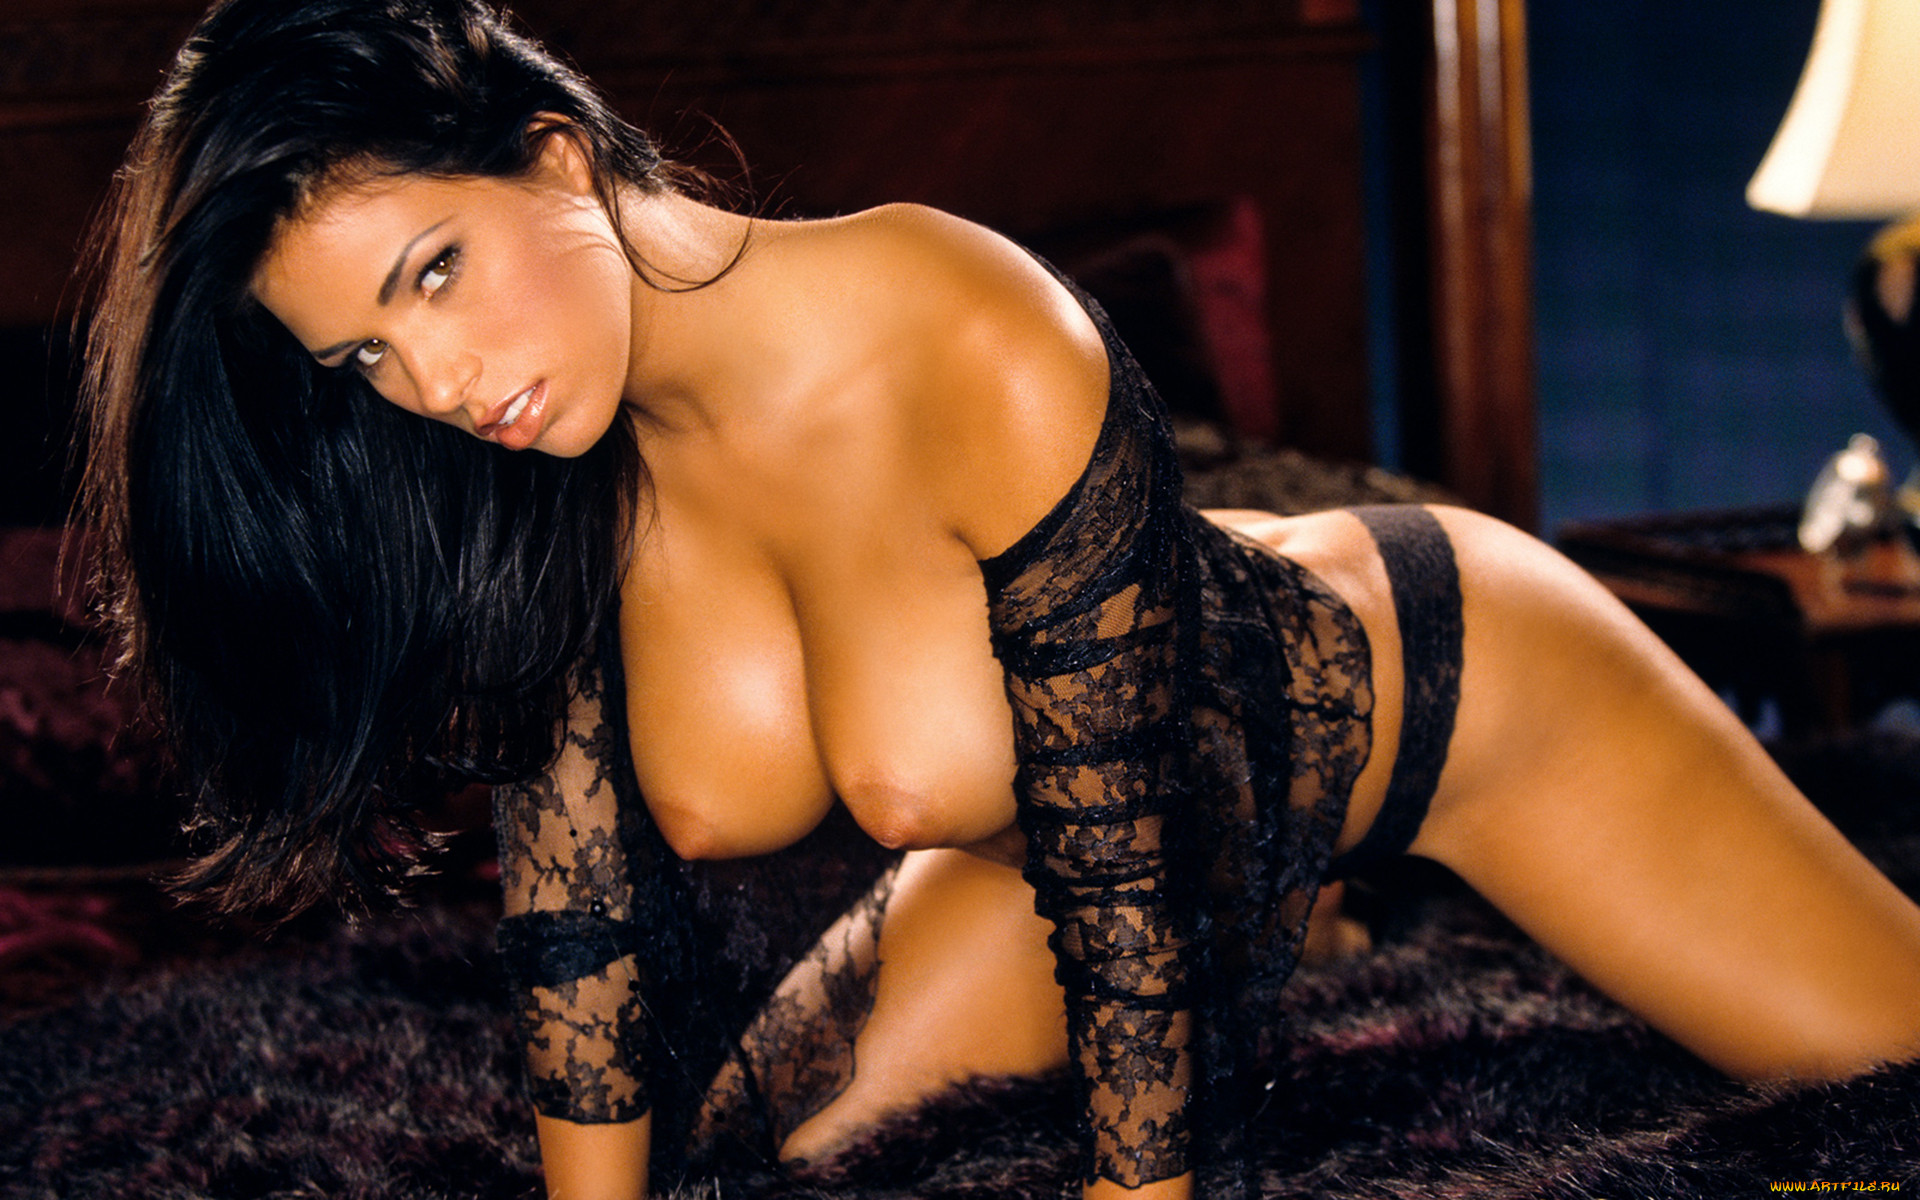 Playboy sex girls